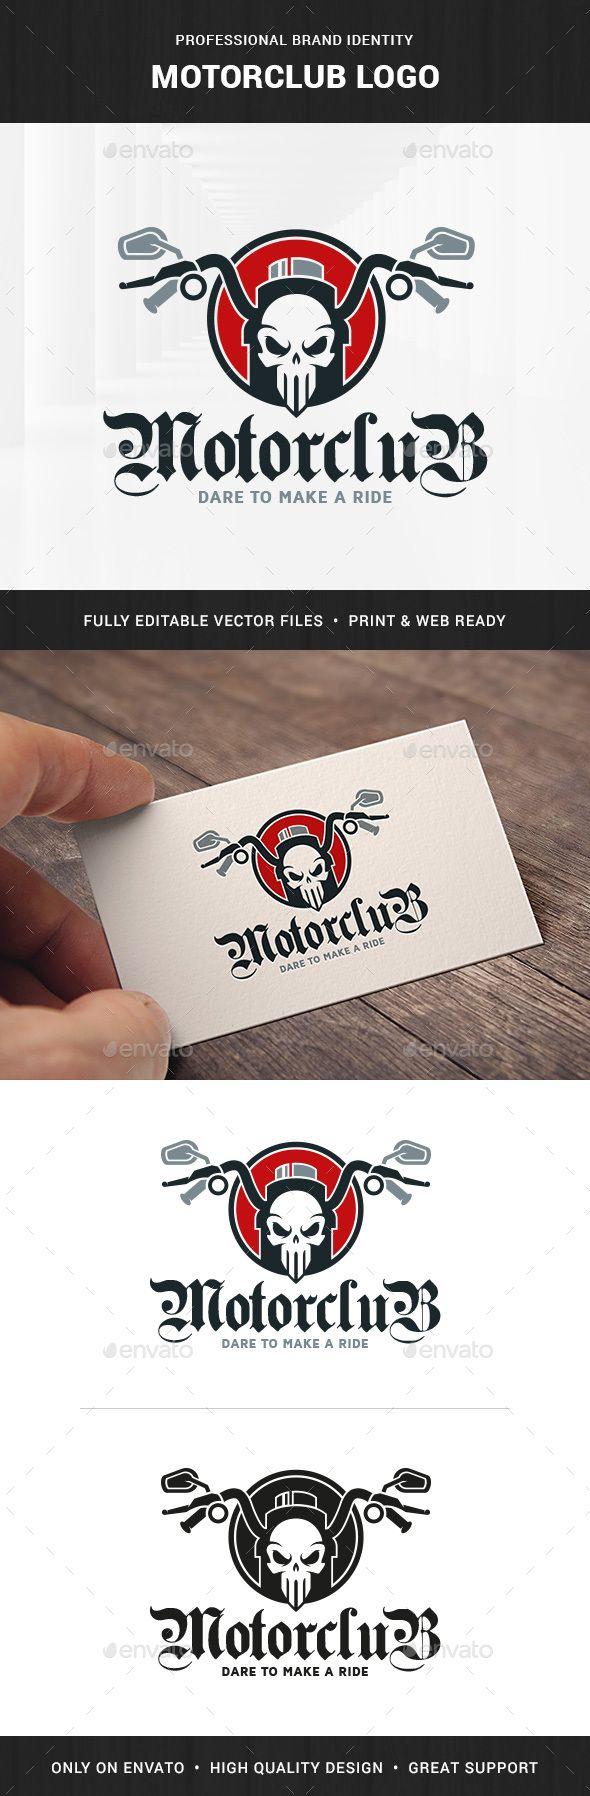 84 best a bike logo templates images on pinterest font logo motor club logo template v2 biocorpaavc Images